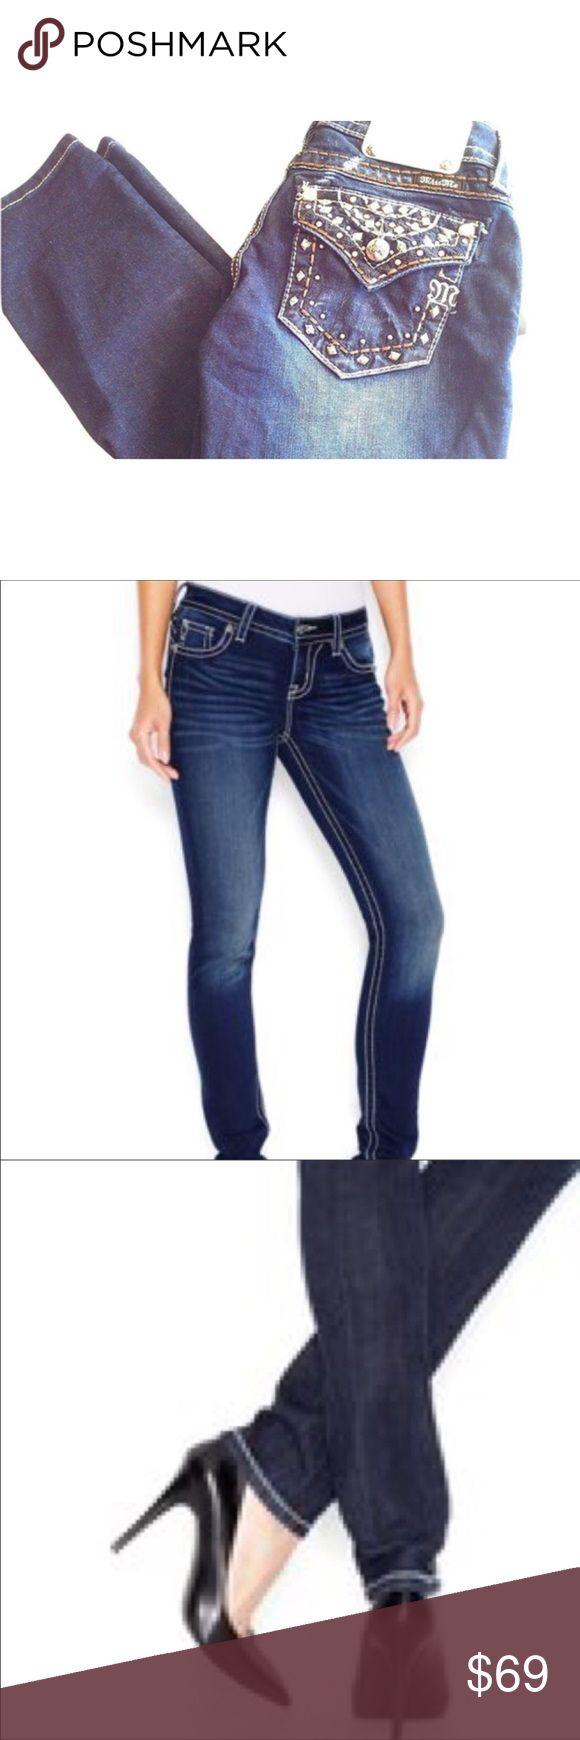 Miss Me Flap-Pocket Cropped Skinny Jeans B39 Miss Me Women's Flap-Pocket Cropped Skinny Jeans Dark Blue.Crop skinny jeans Embellished rear pockets, Flap pocket, Logo patch. 88% Cotton, 10% Polyester, 2% Elastane. Miss Me Flap-Pocket Cropped Skinny Jeans B39 Miss Me Jeans